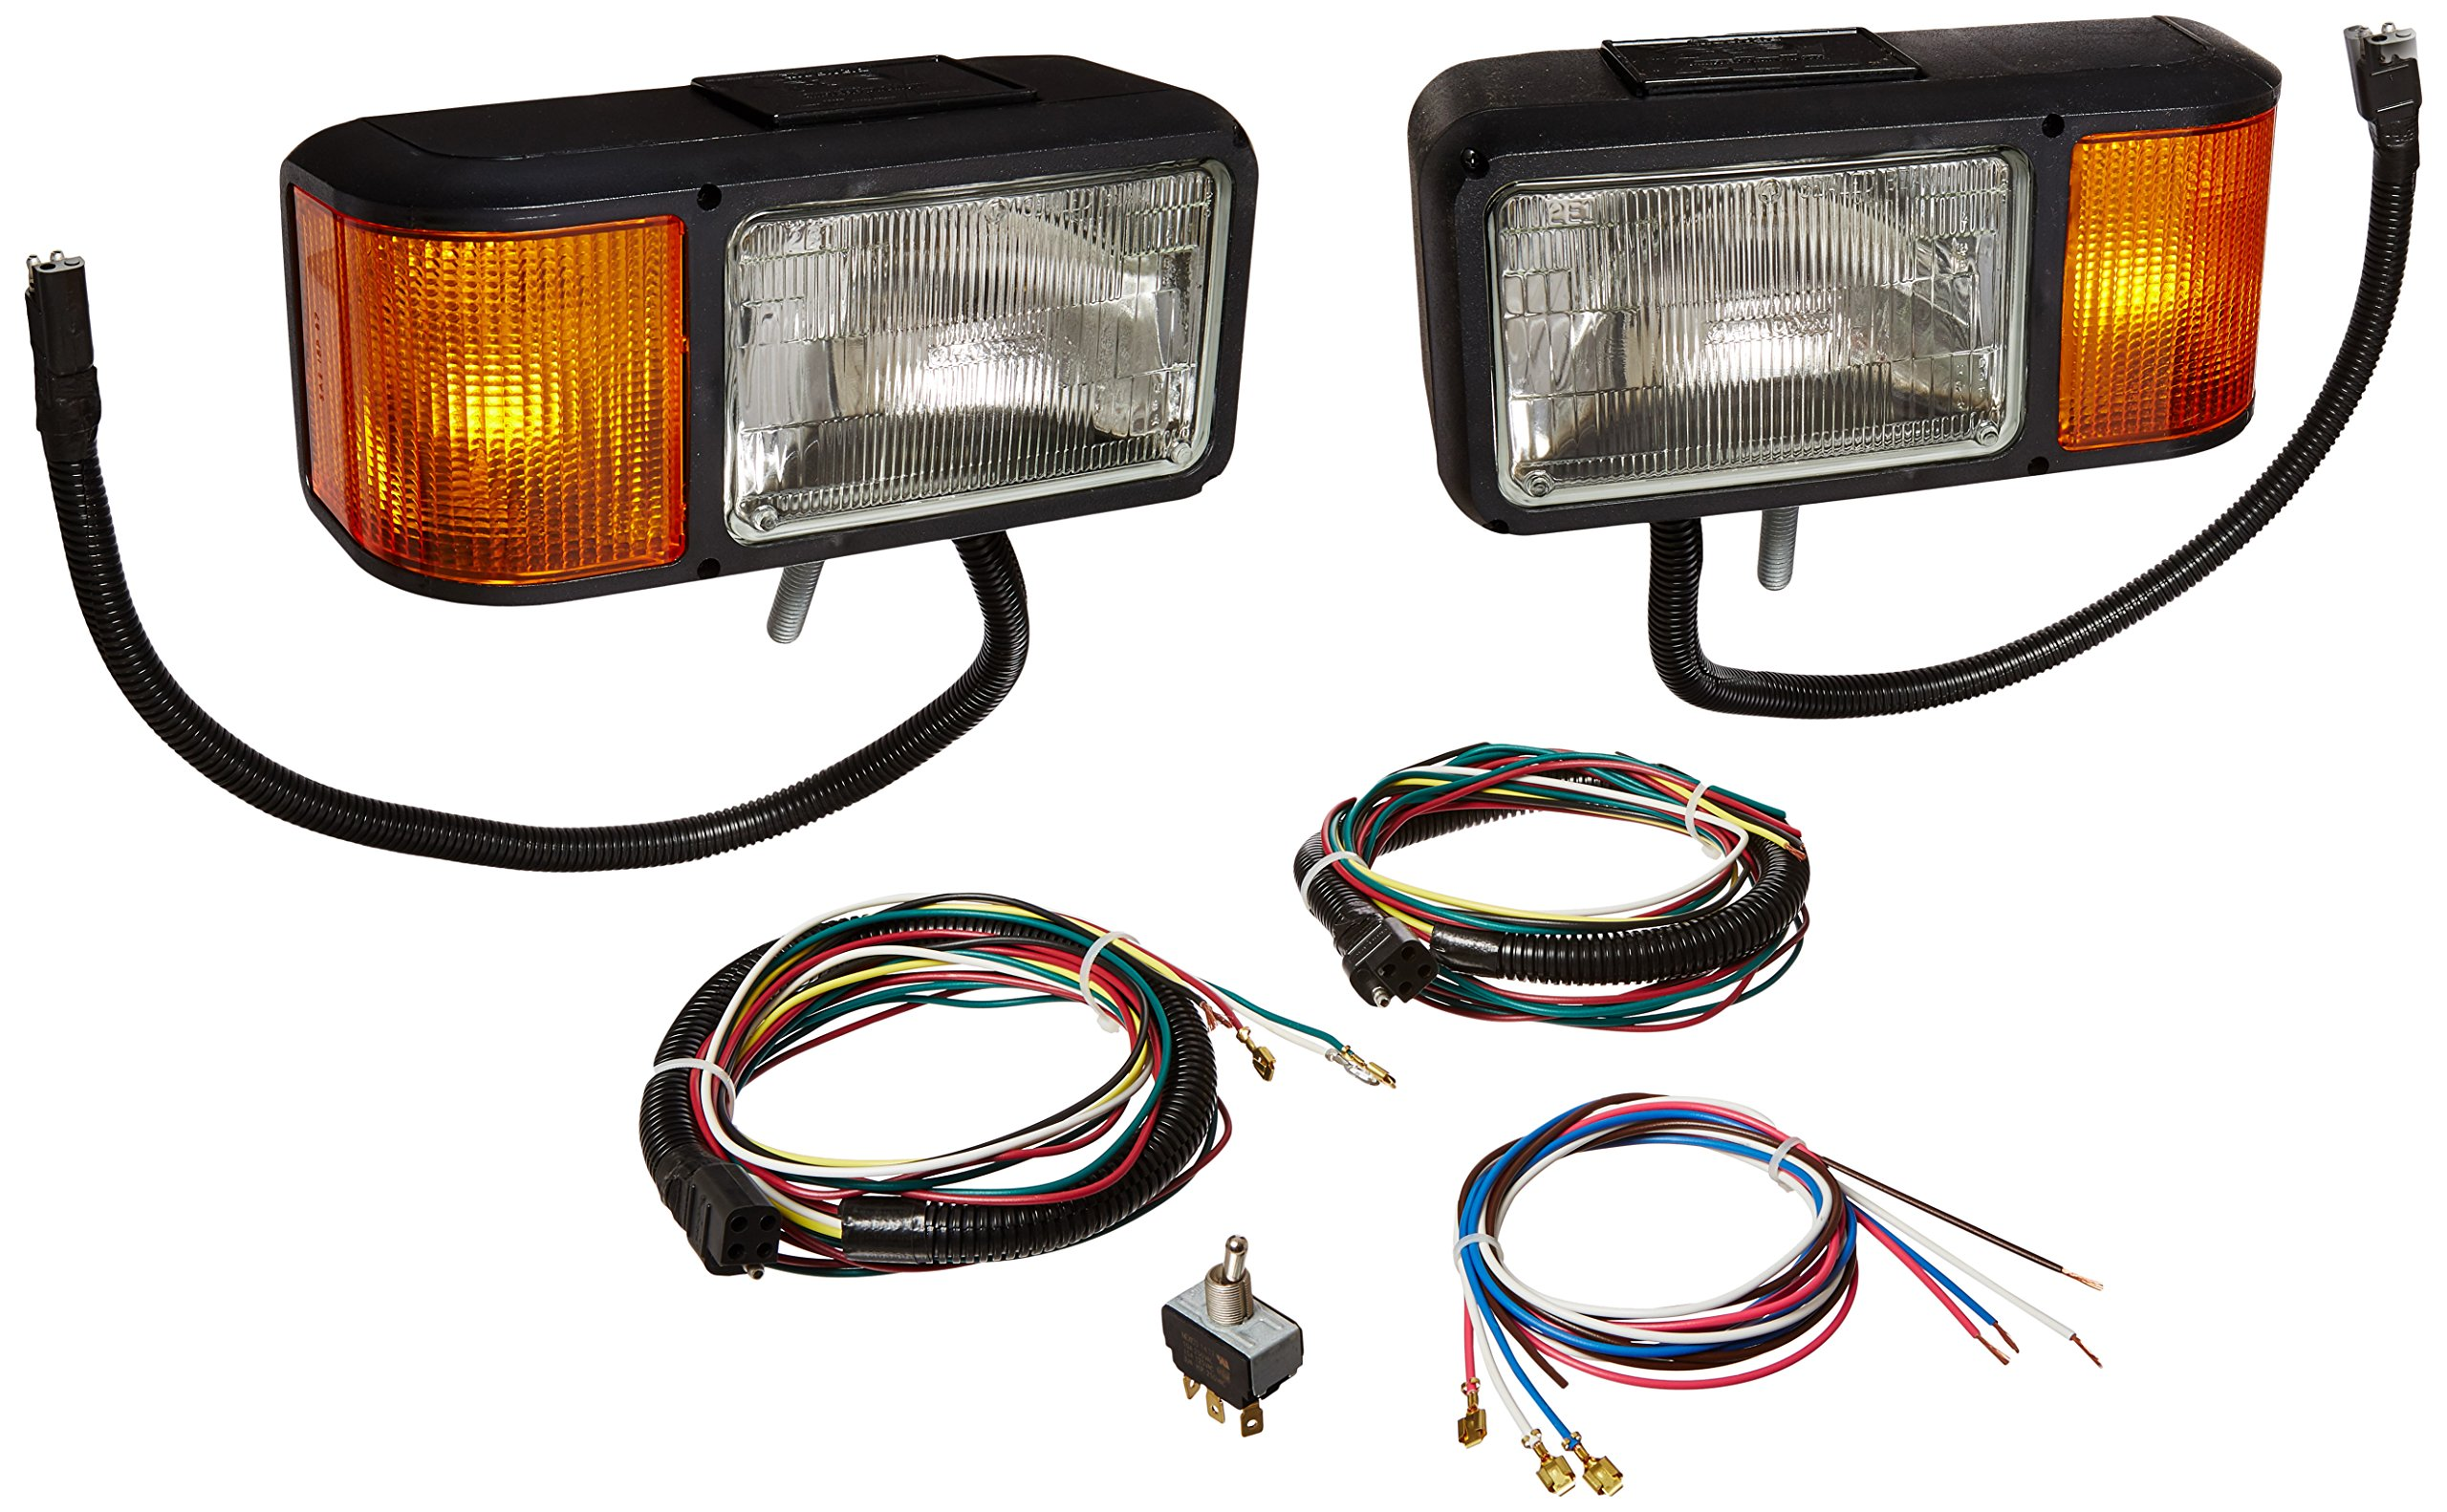 Truck-Lite 80888 Economy Snow Plow/ATL Light Kit by Truck-Lite